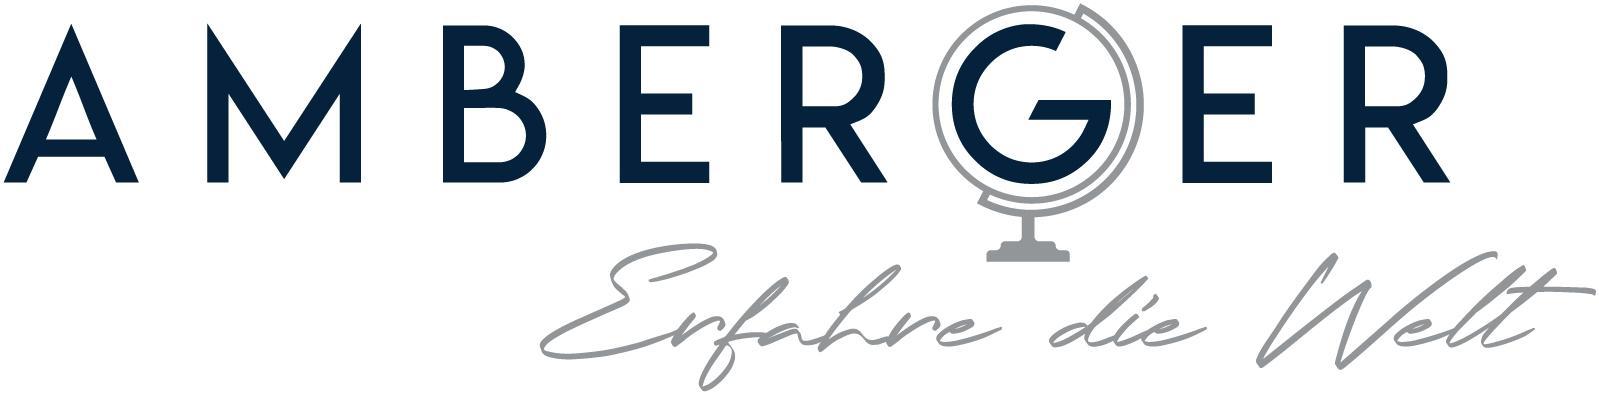 Logo Bustours Amberger GmbH & Co. KG